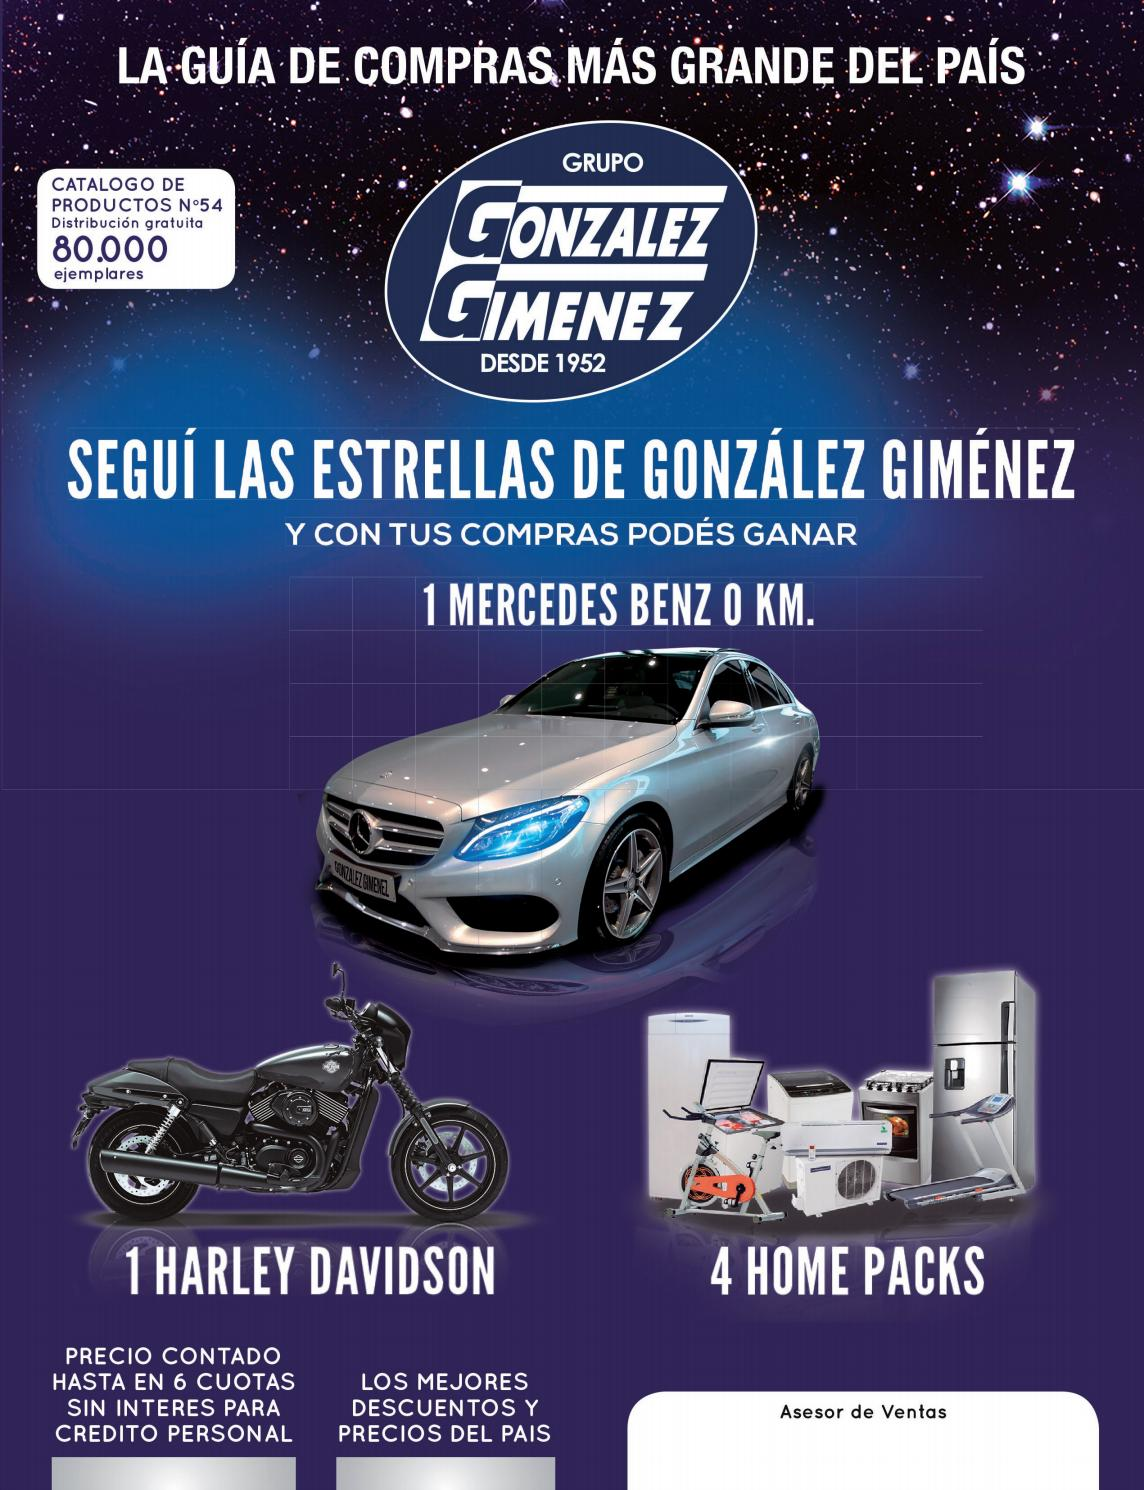 Catálogo Diciembre 2017 by Gonzalez Gimenez - issuu dc793b907e58